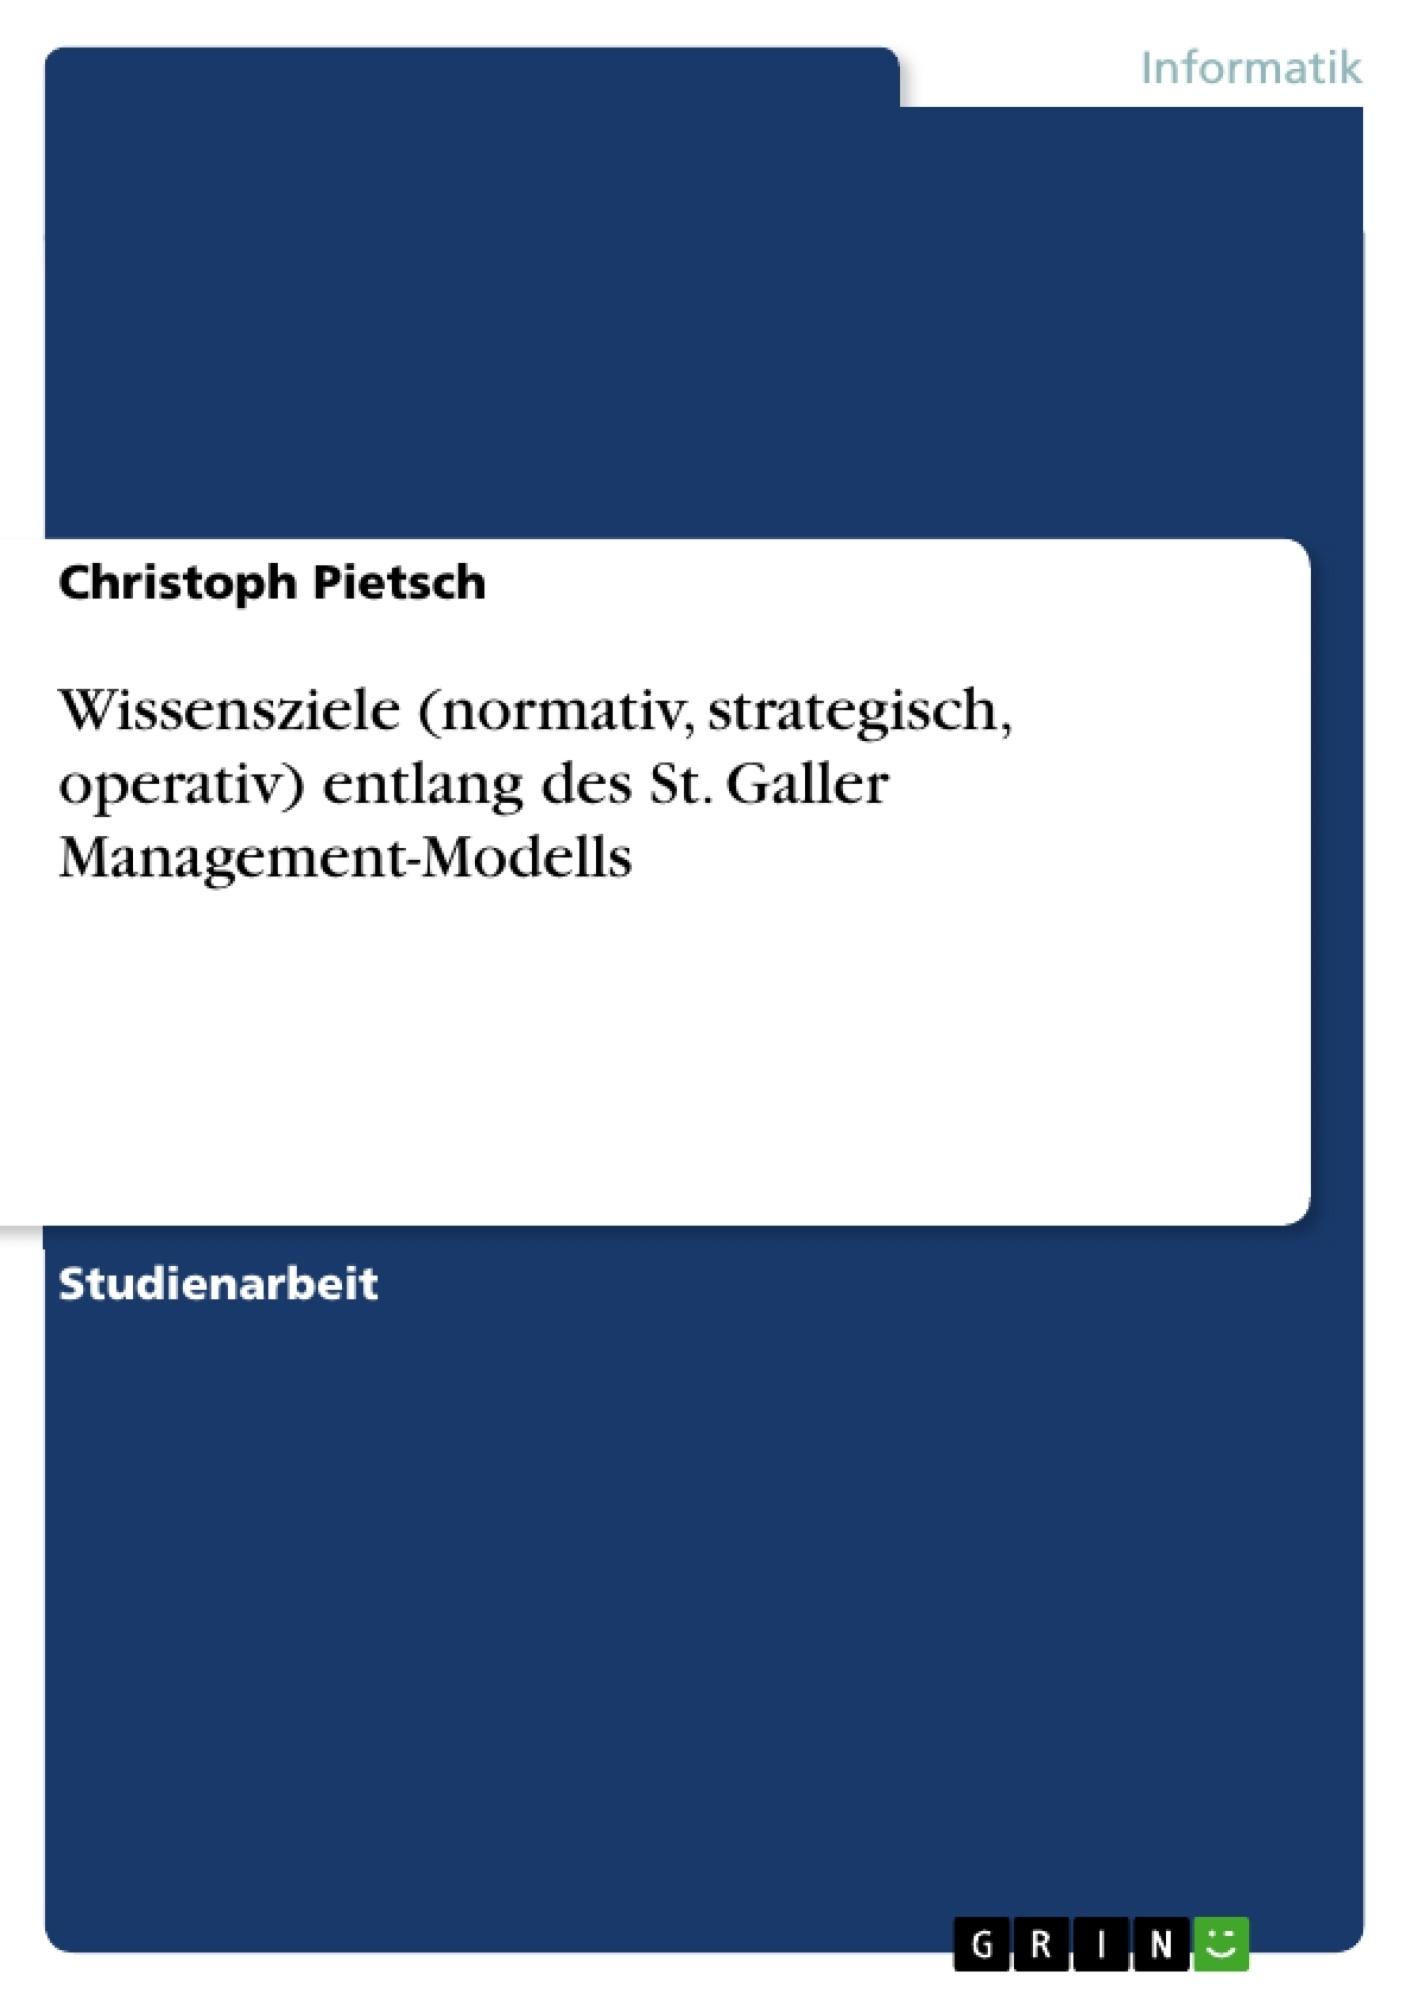 Titel: Wissensziele (normativ, strategisch, operativ) entlang des St. Galler Management-Modells